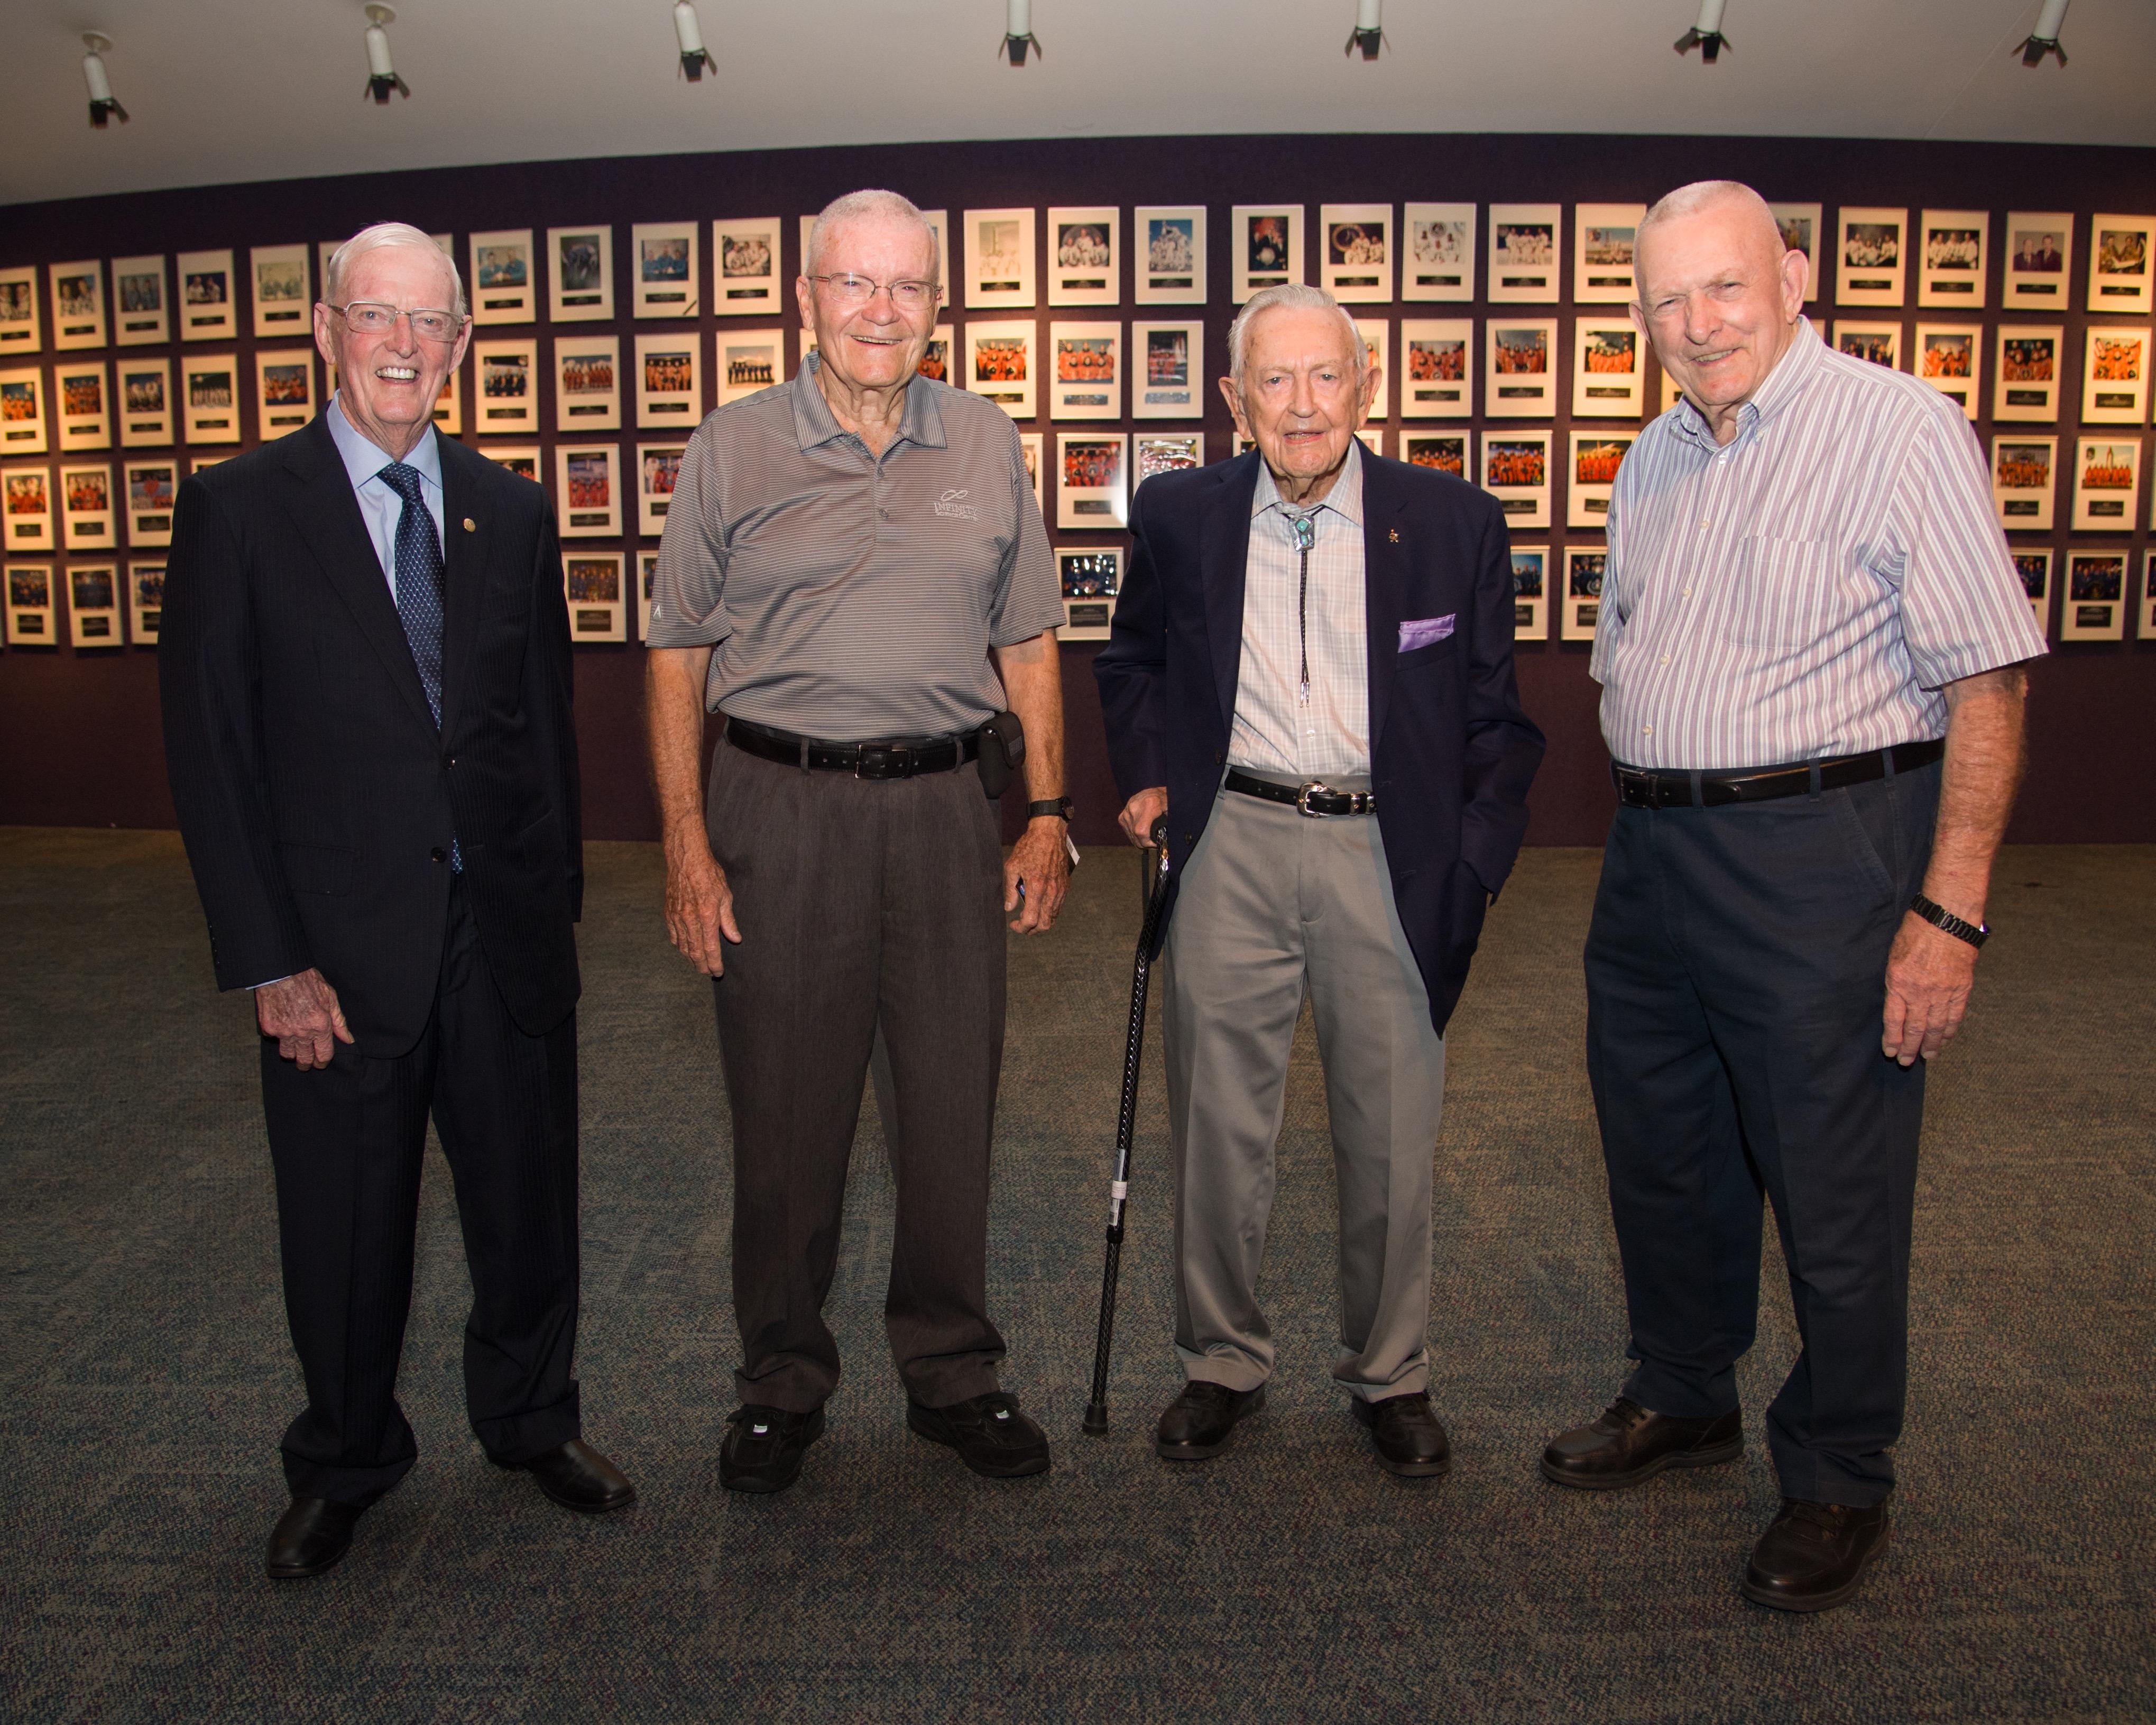 Apollo-Era Veterans Gather to See Movie About Neil Armstrong